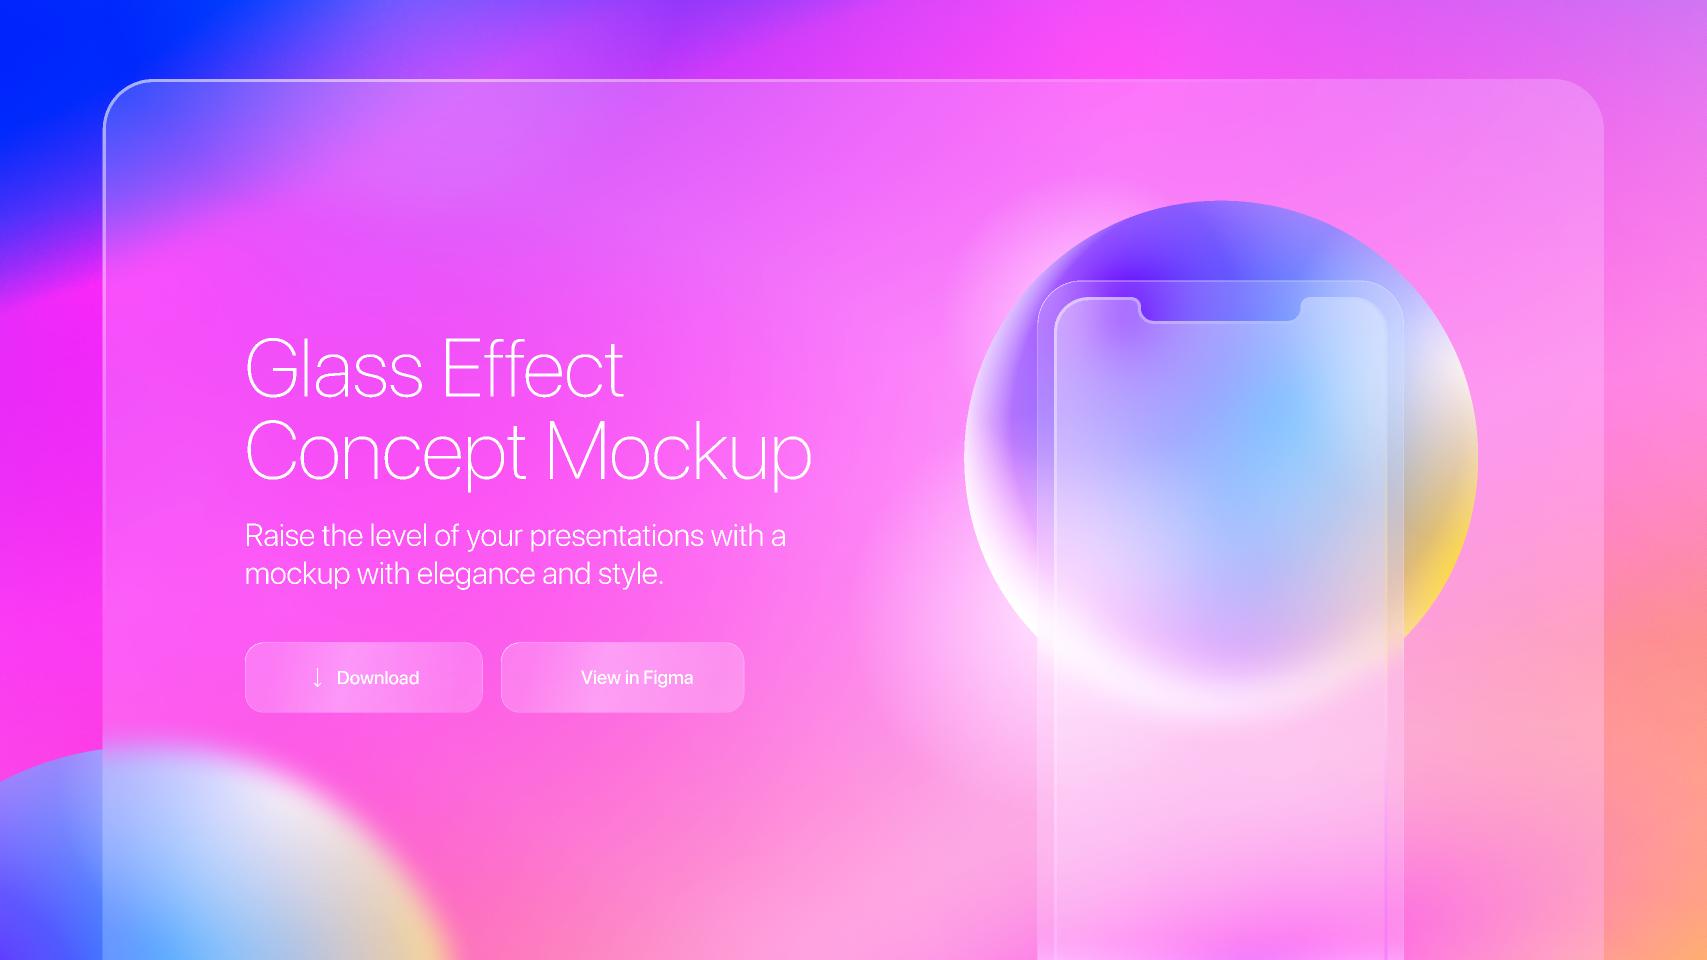 Glass Effect Concept Mockup figma